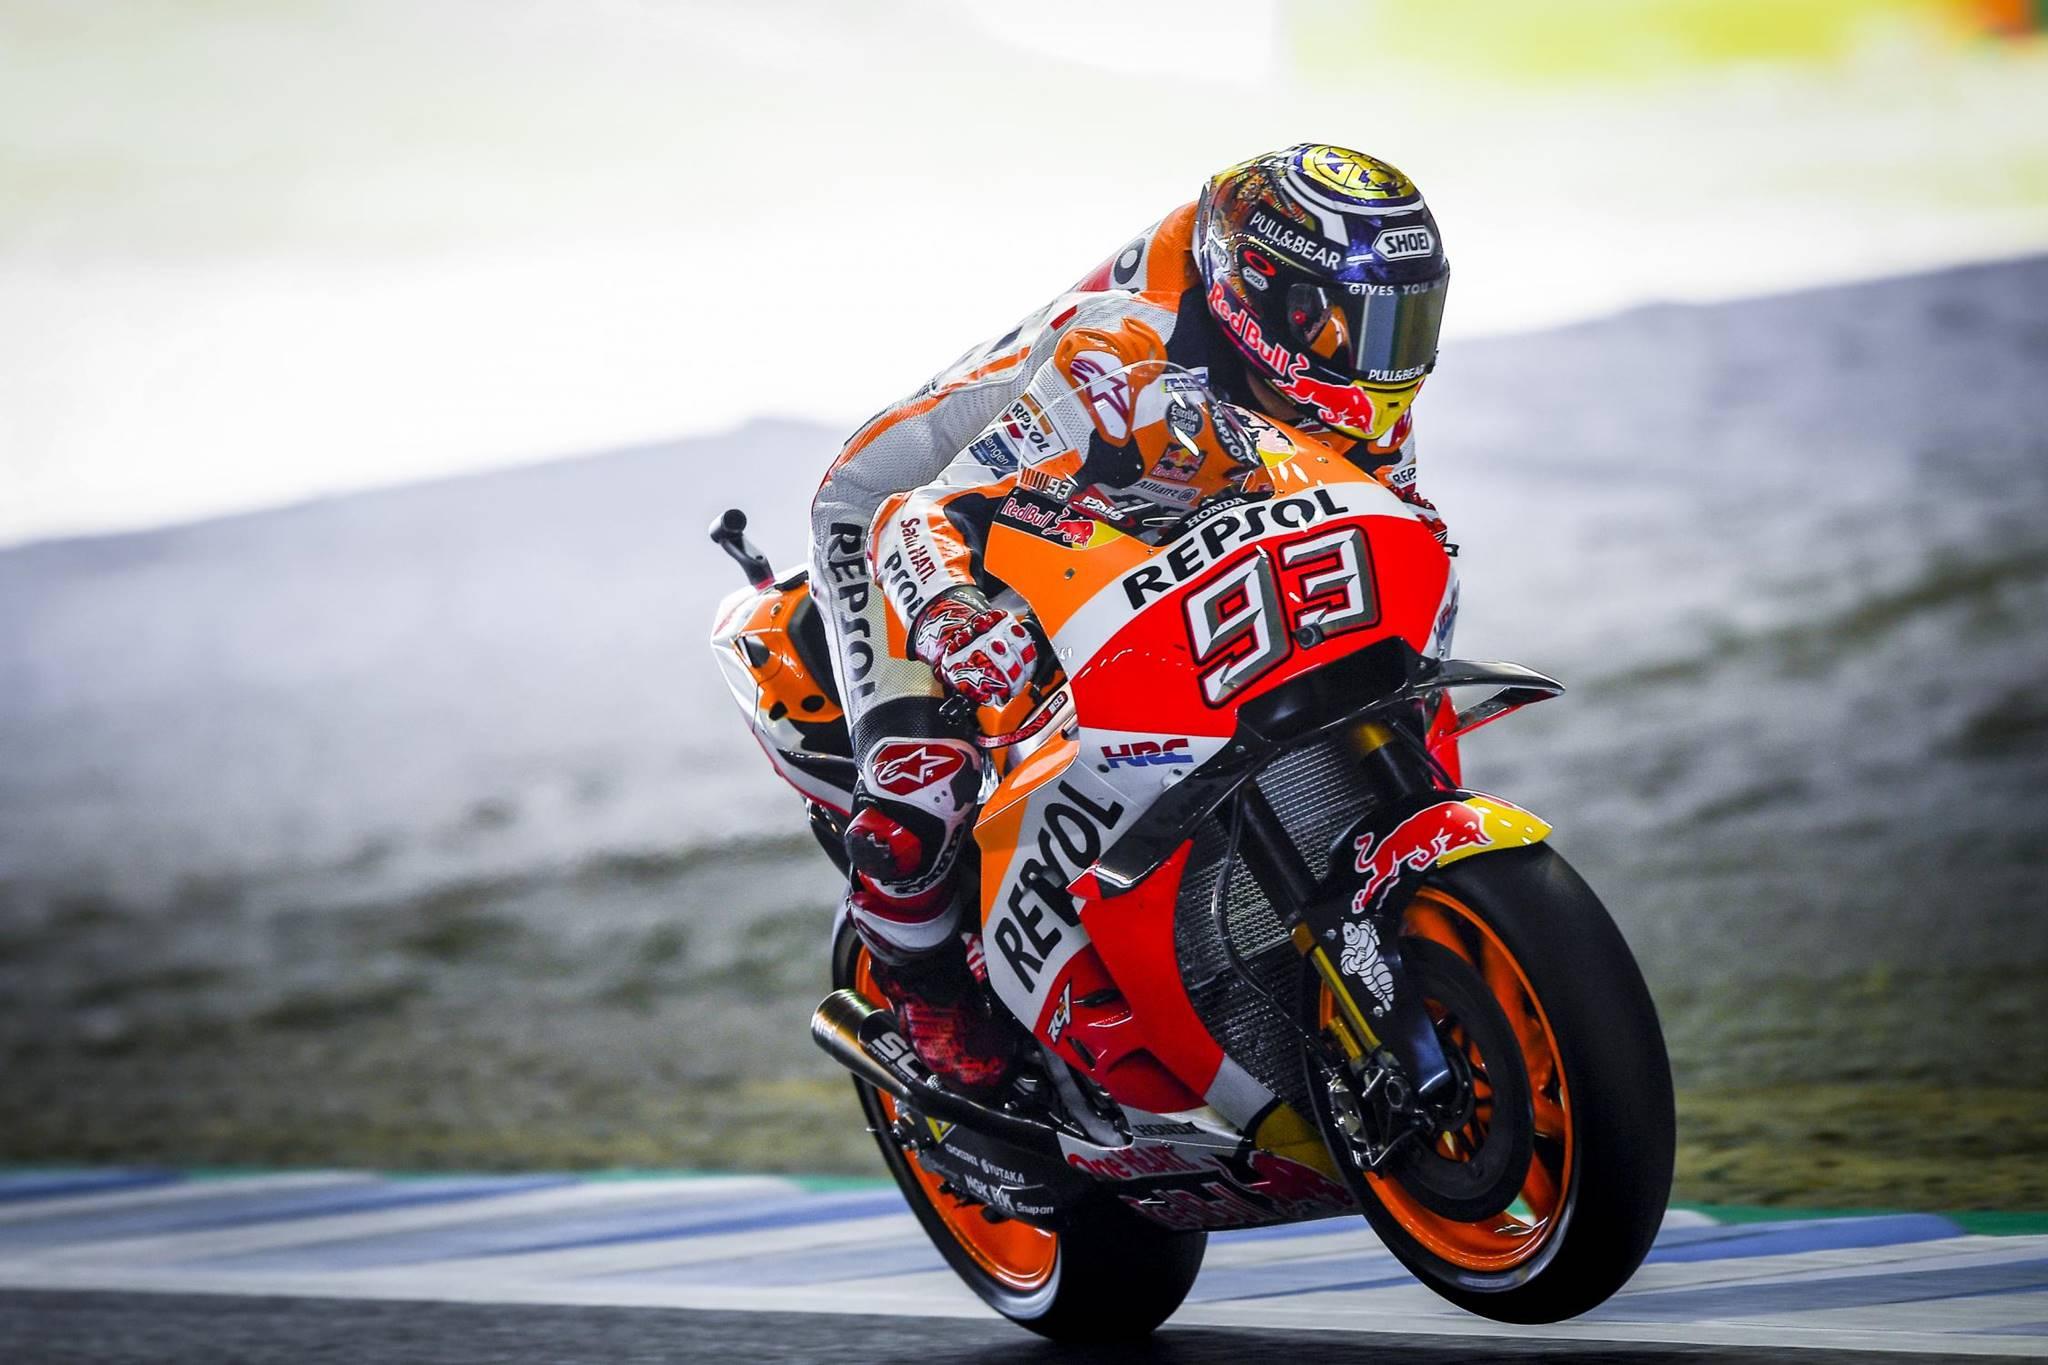 MotoGP_2018_JapaneseGP_Xe_Tinhte_019.jpg